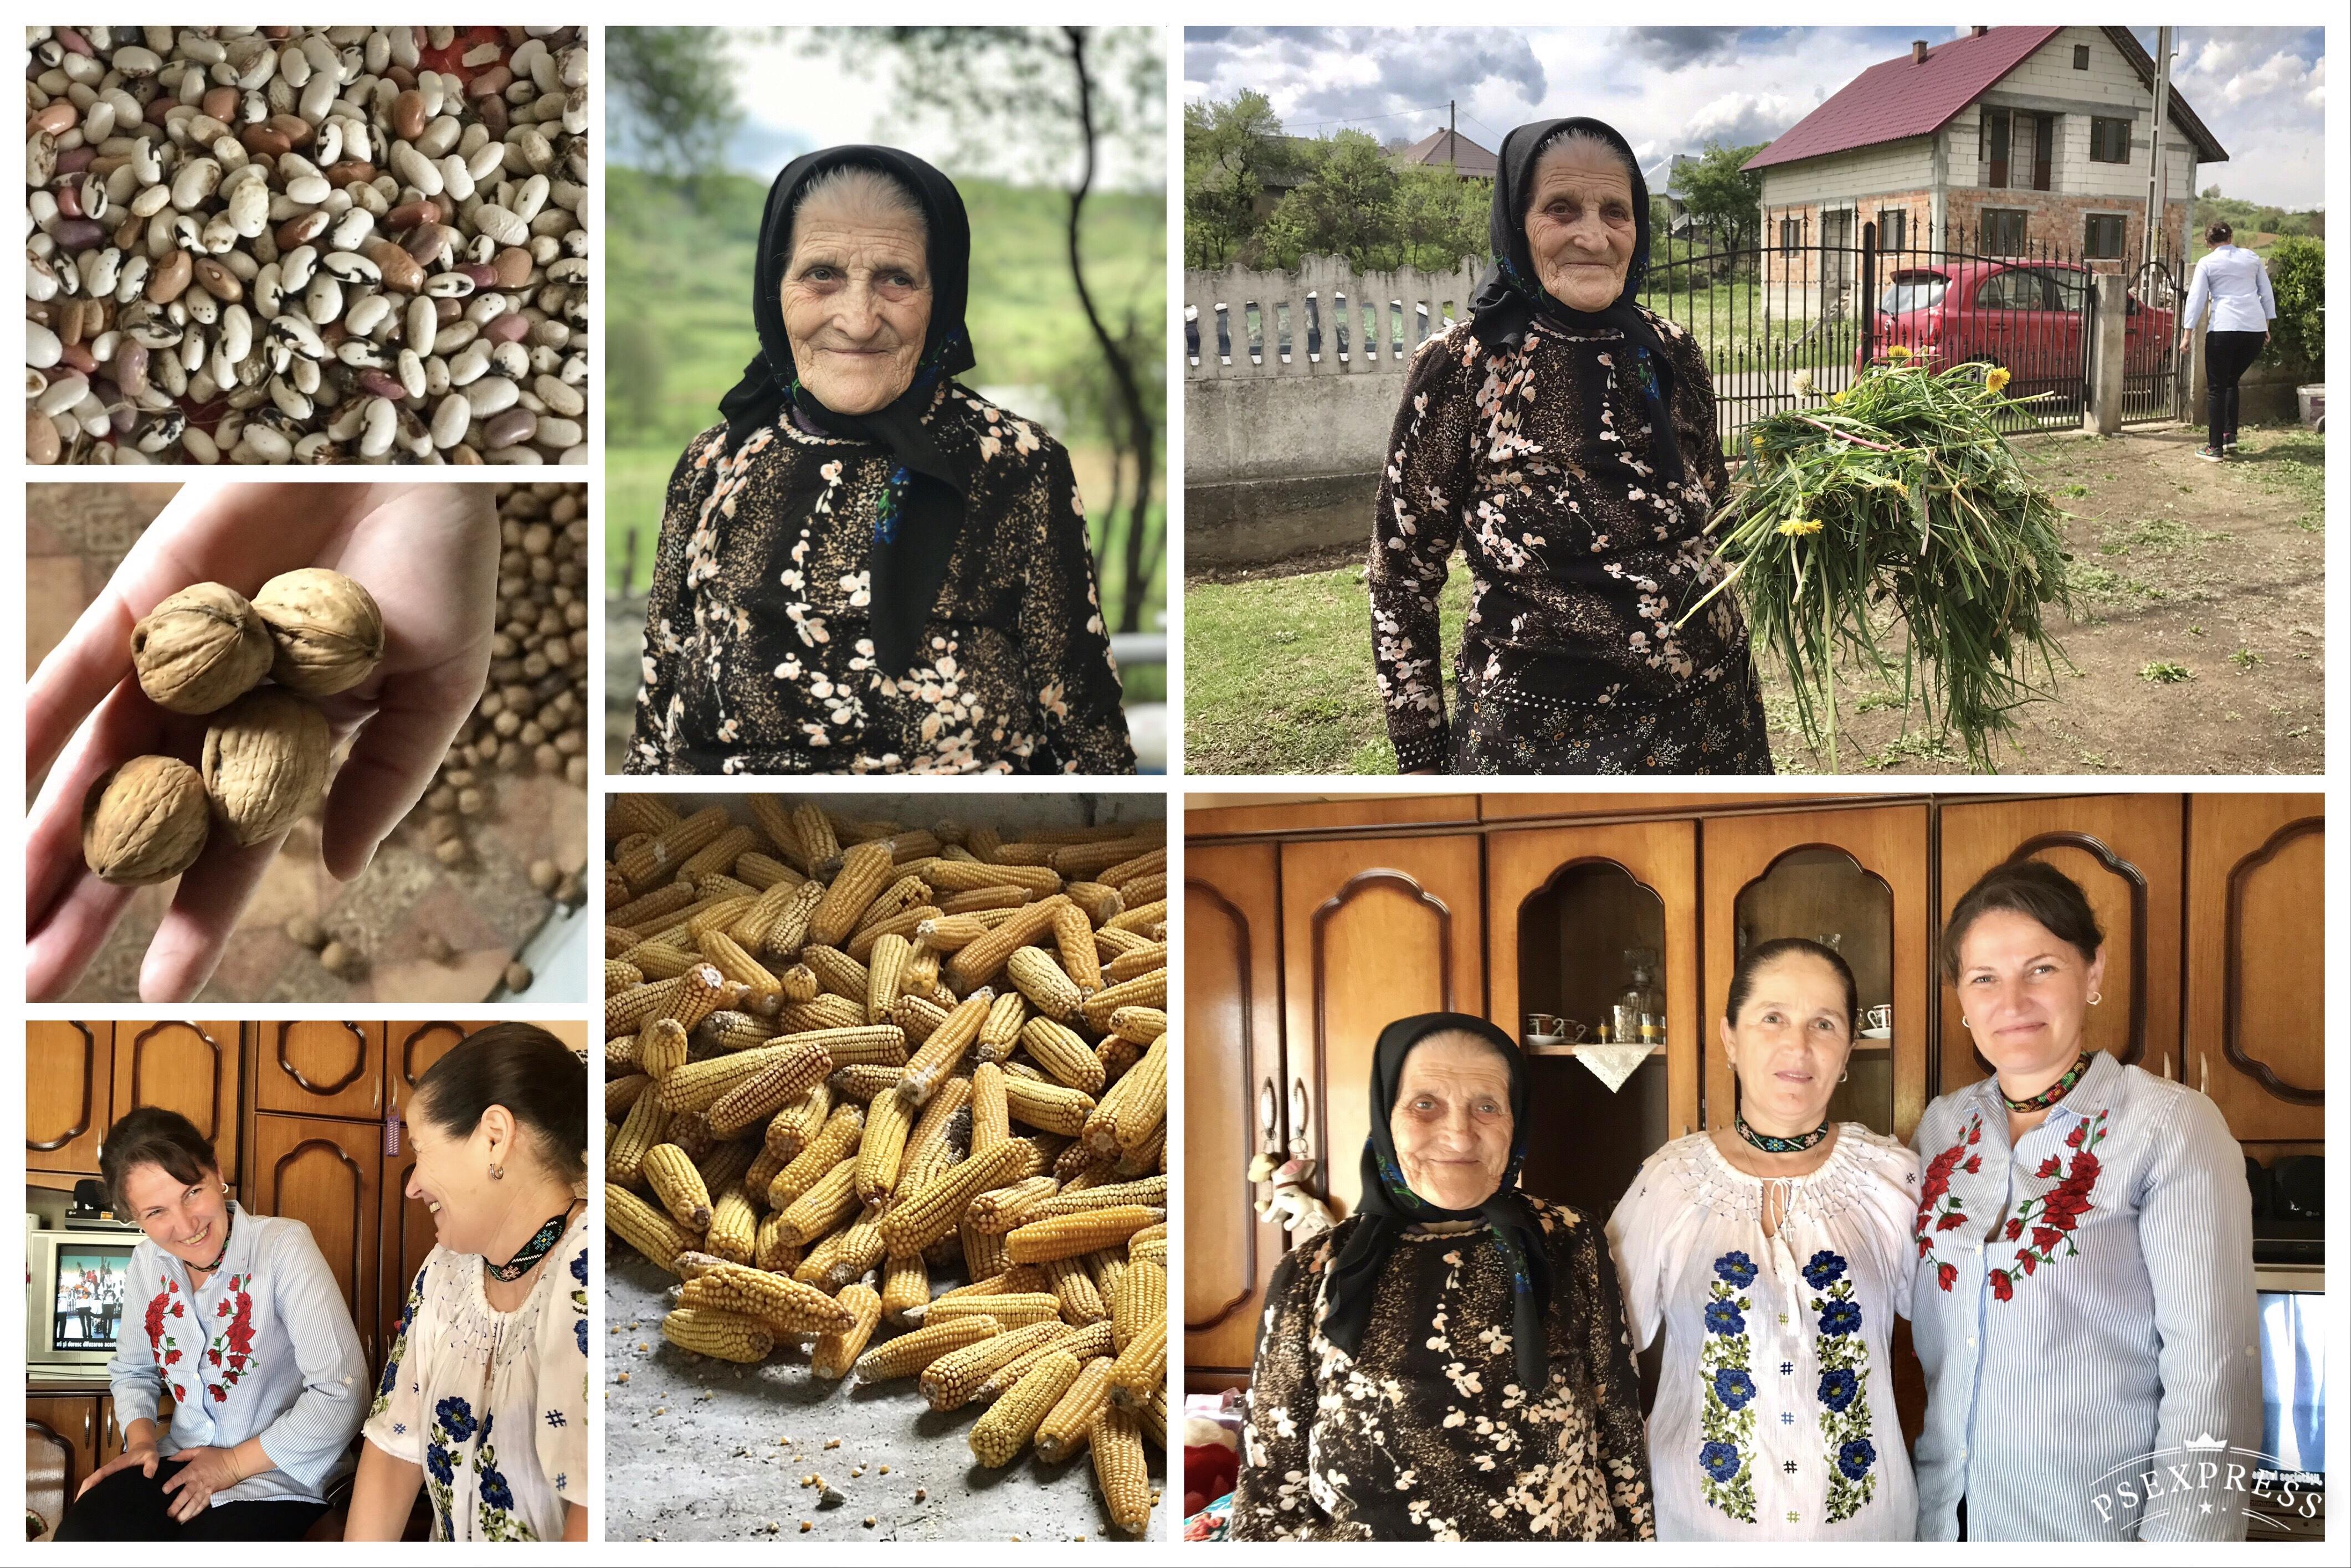 Portrait Transylvania Gospodina collage